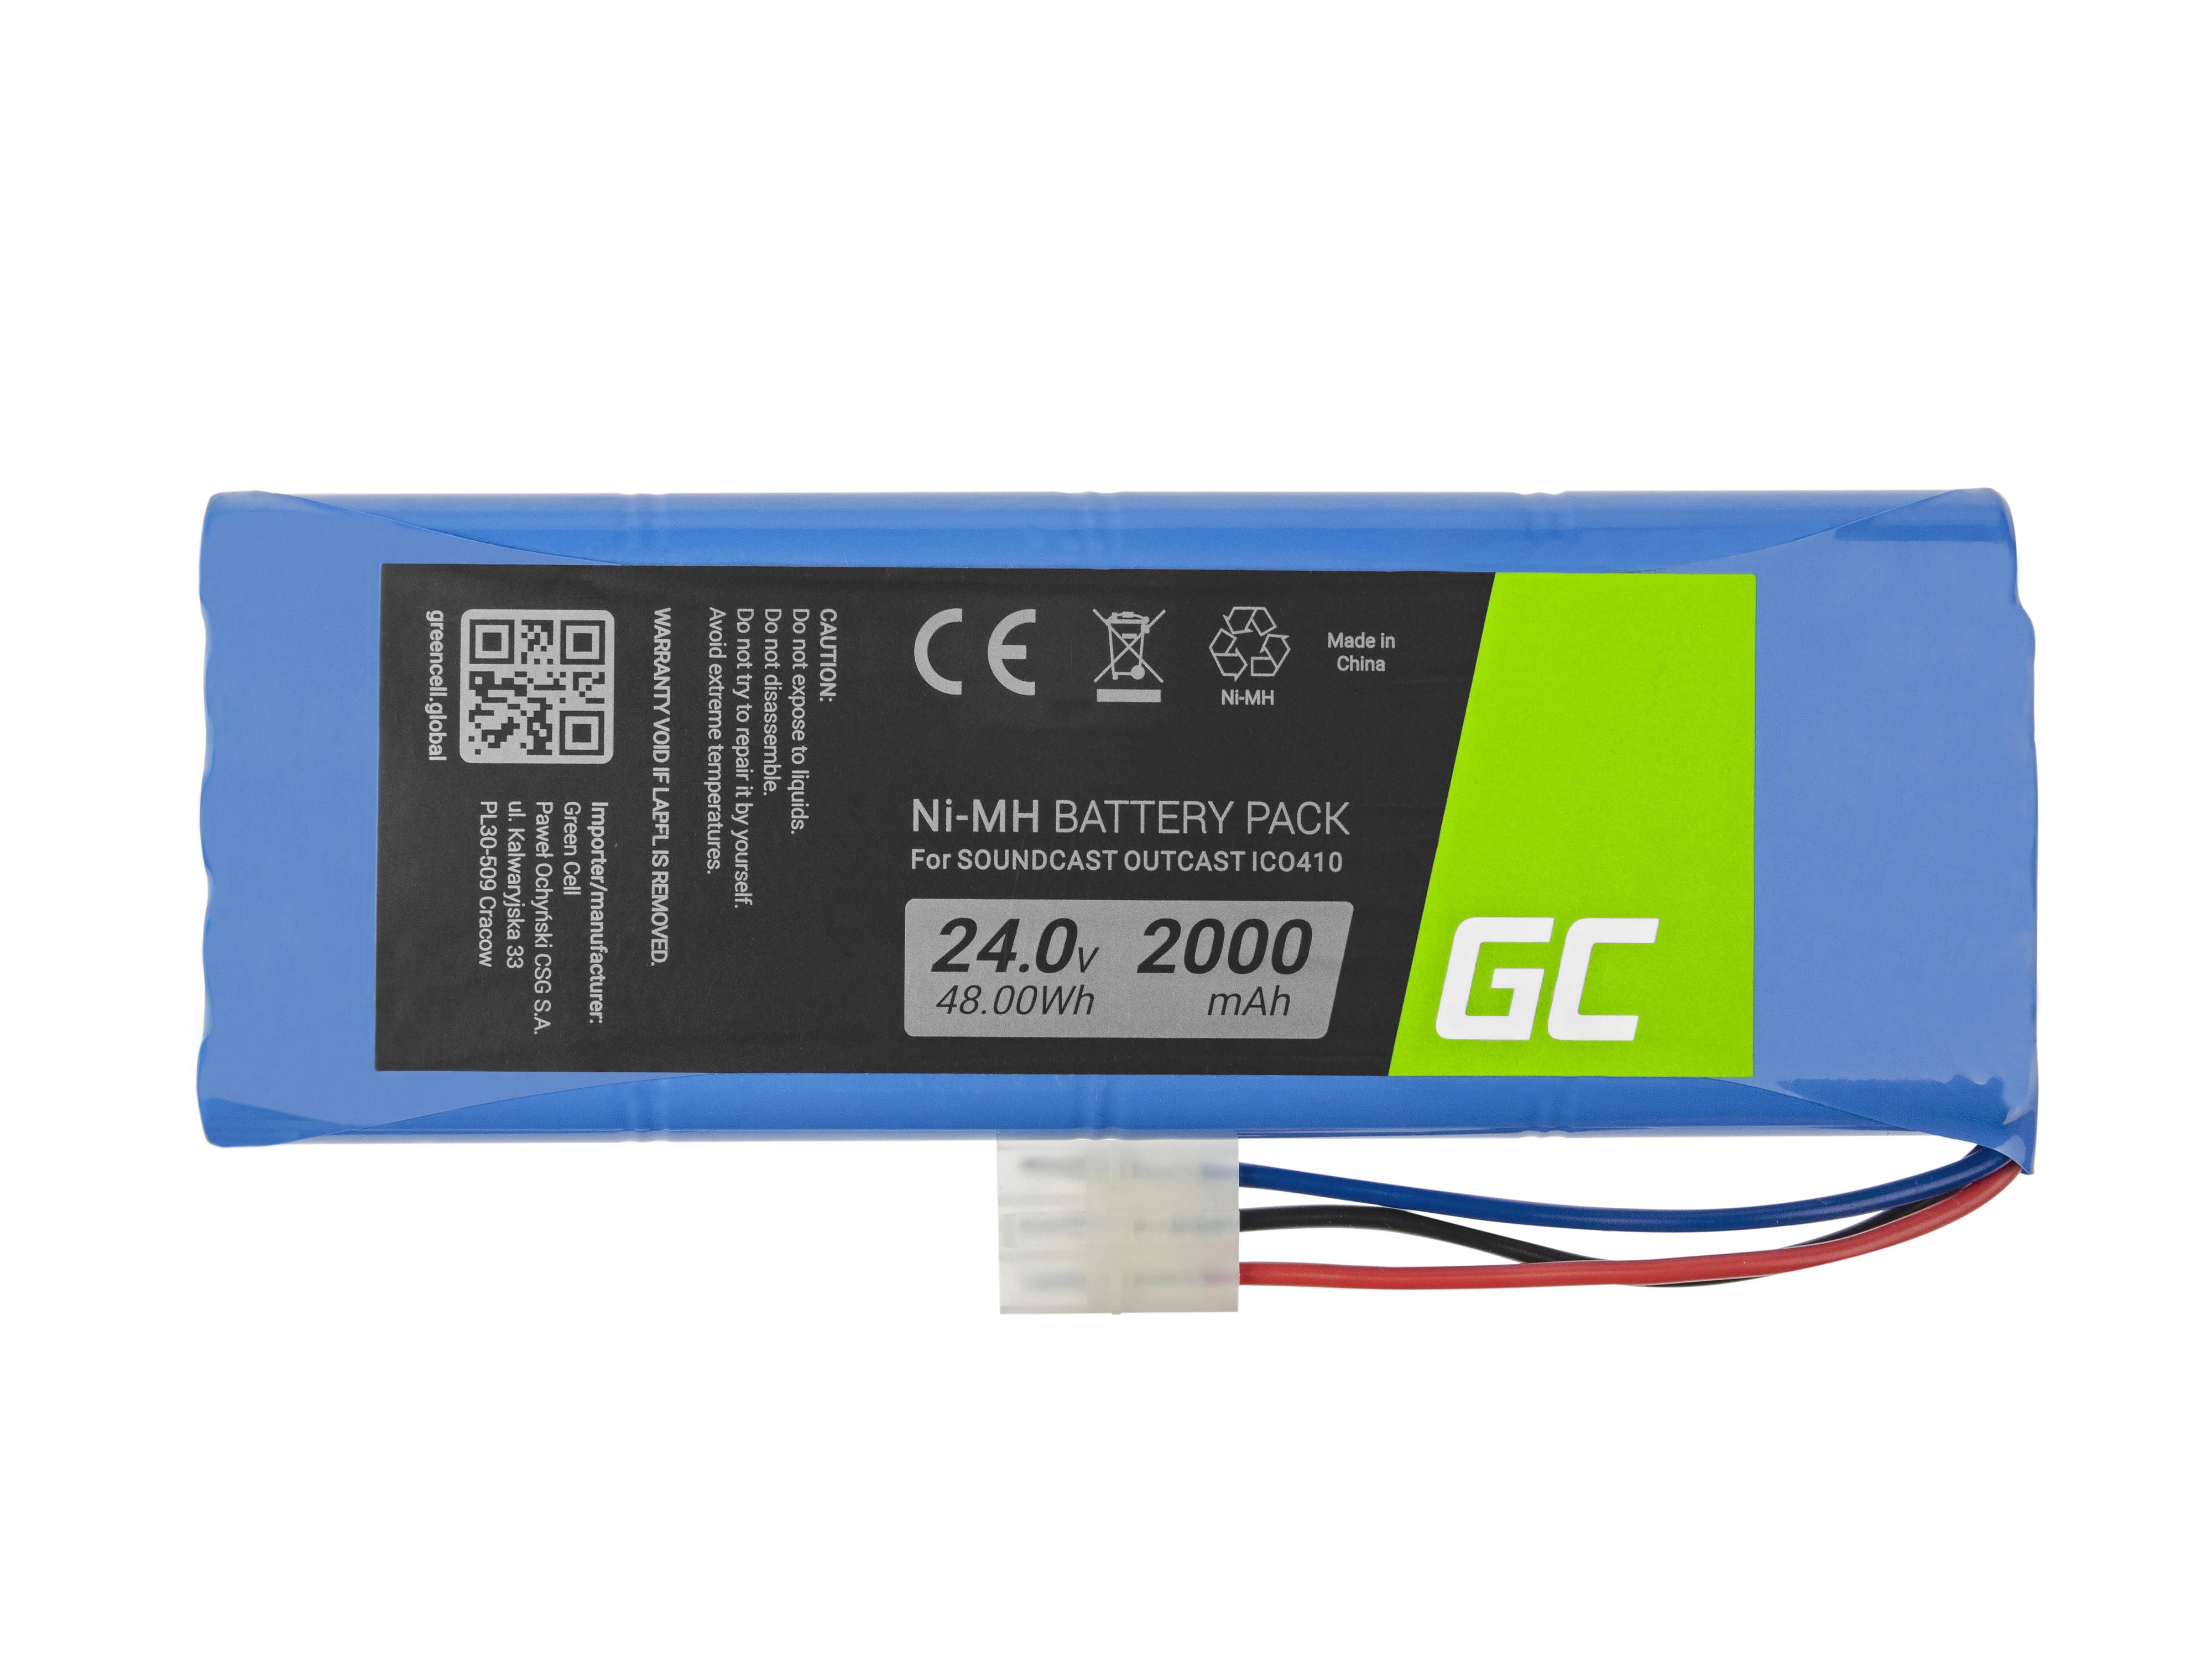 Green Cell SP16 Baterie Soundcast Outcast 20S-1P ICO410 ICO411a 2000mAh Ni-MH – neoriginální